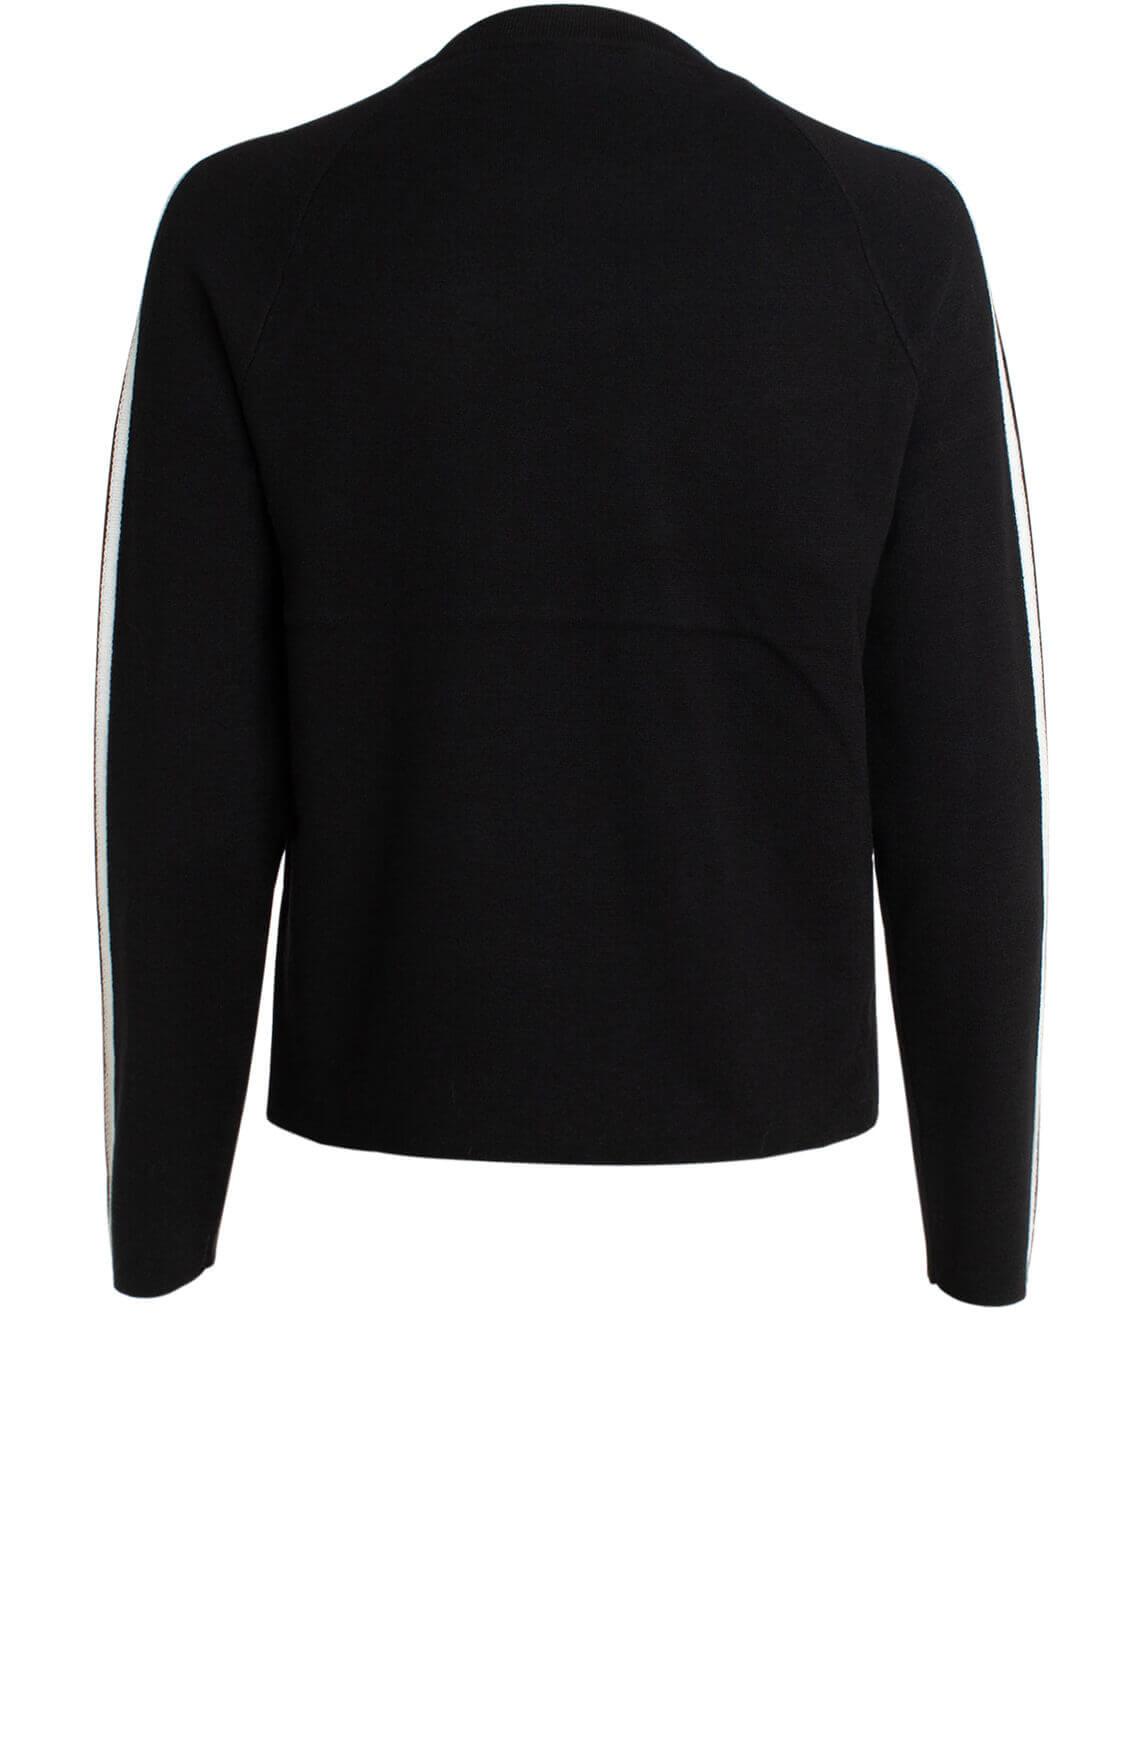 Anna Dames Sweater met witte bies zwart